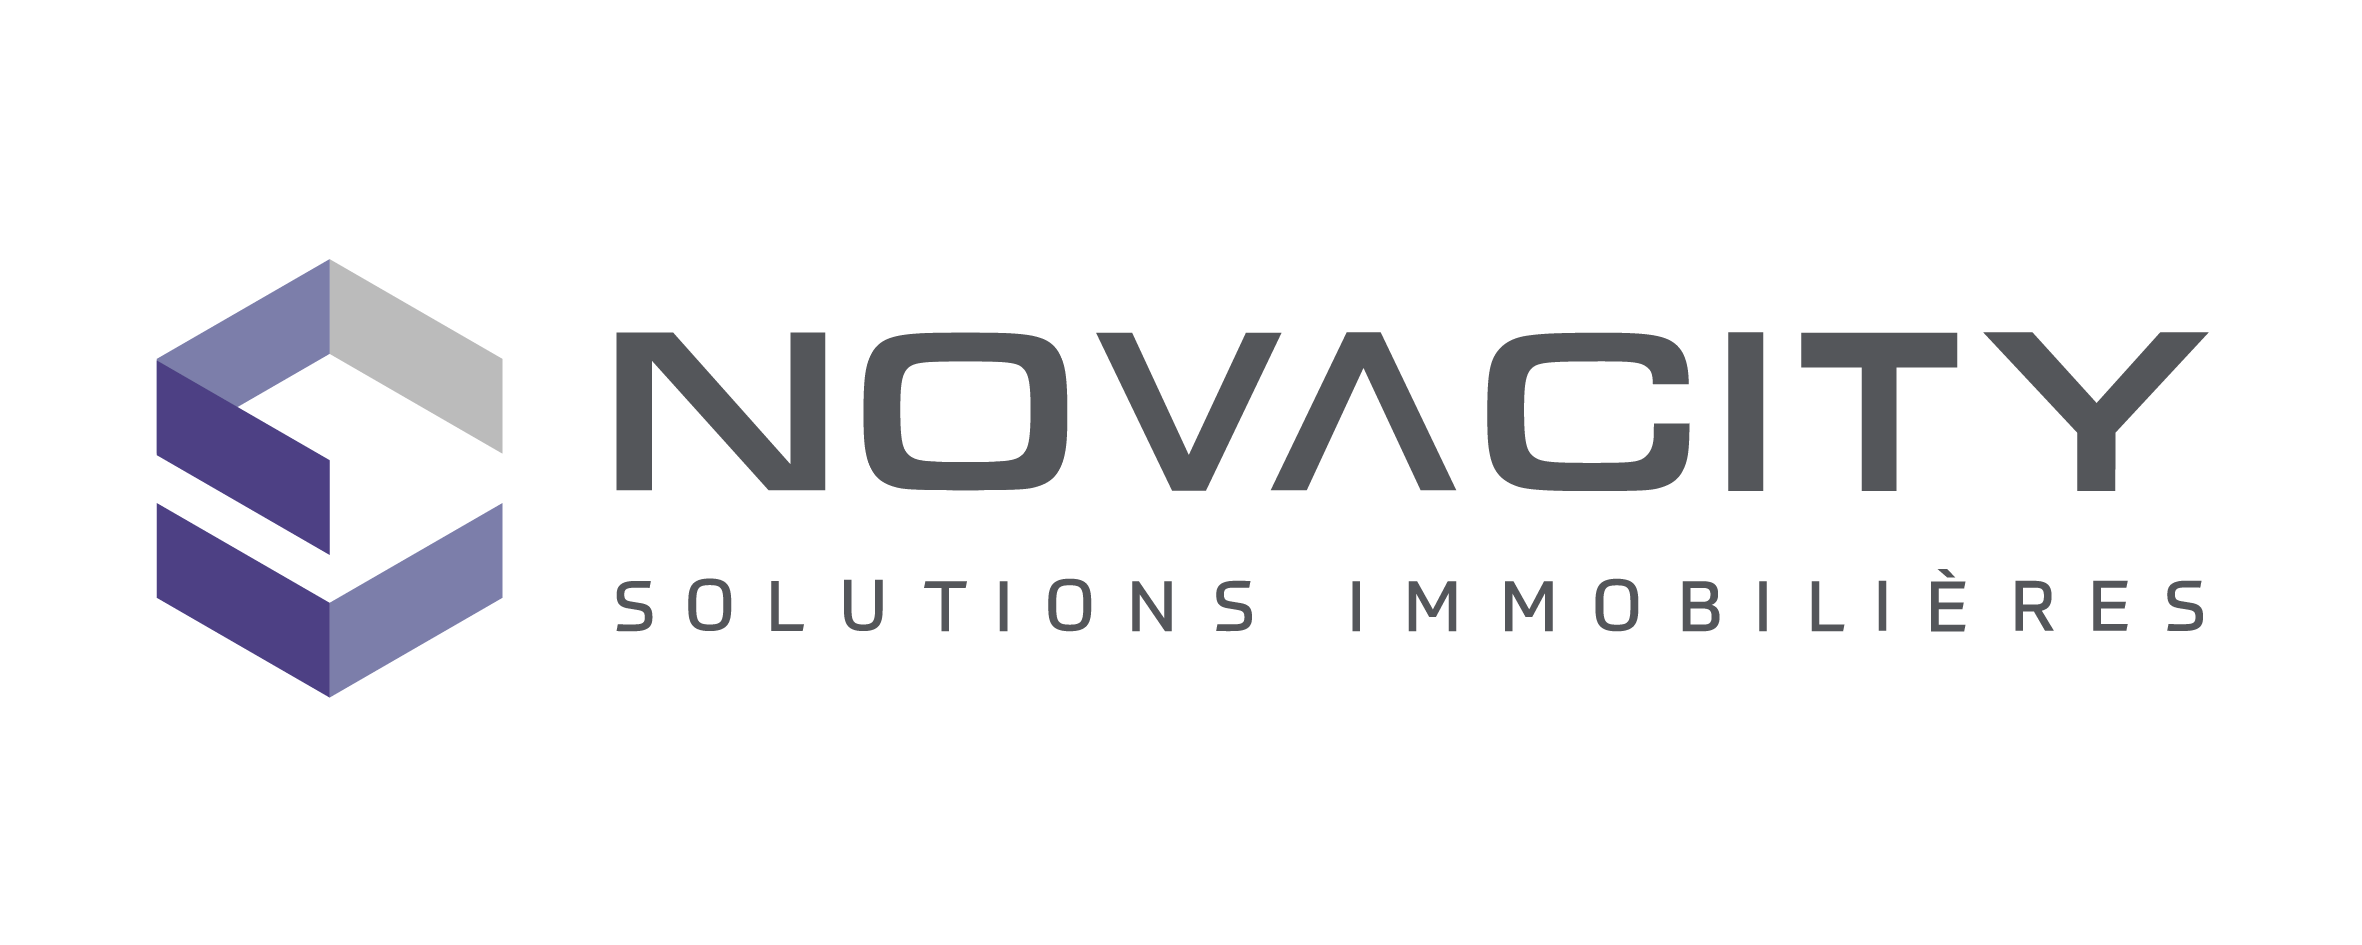 https://www.novacity.ch/wp-content/uploads/2020/11/NOVACITY.png